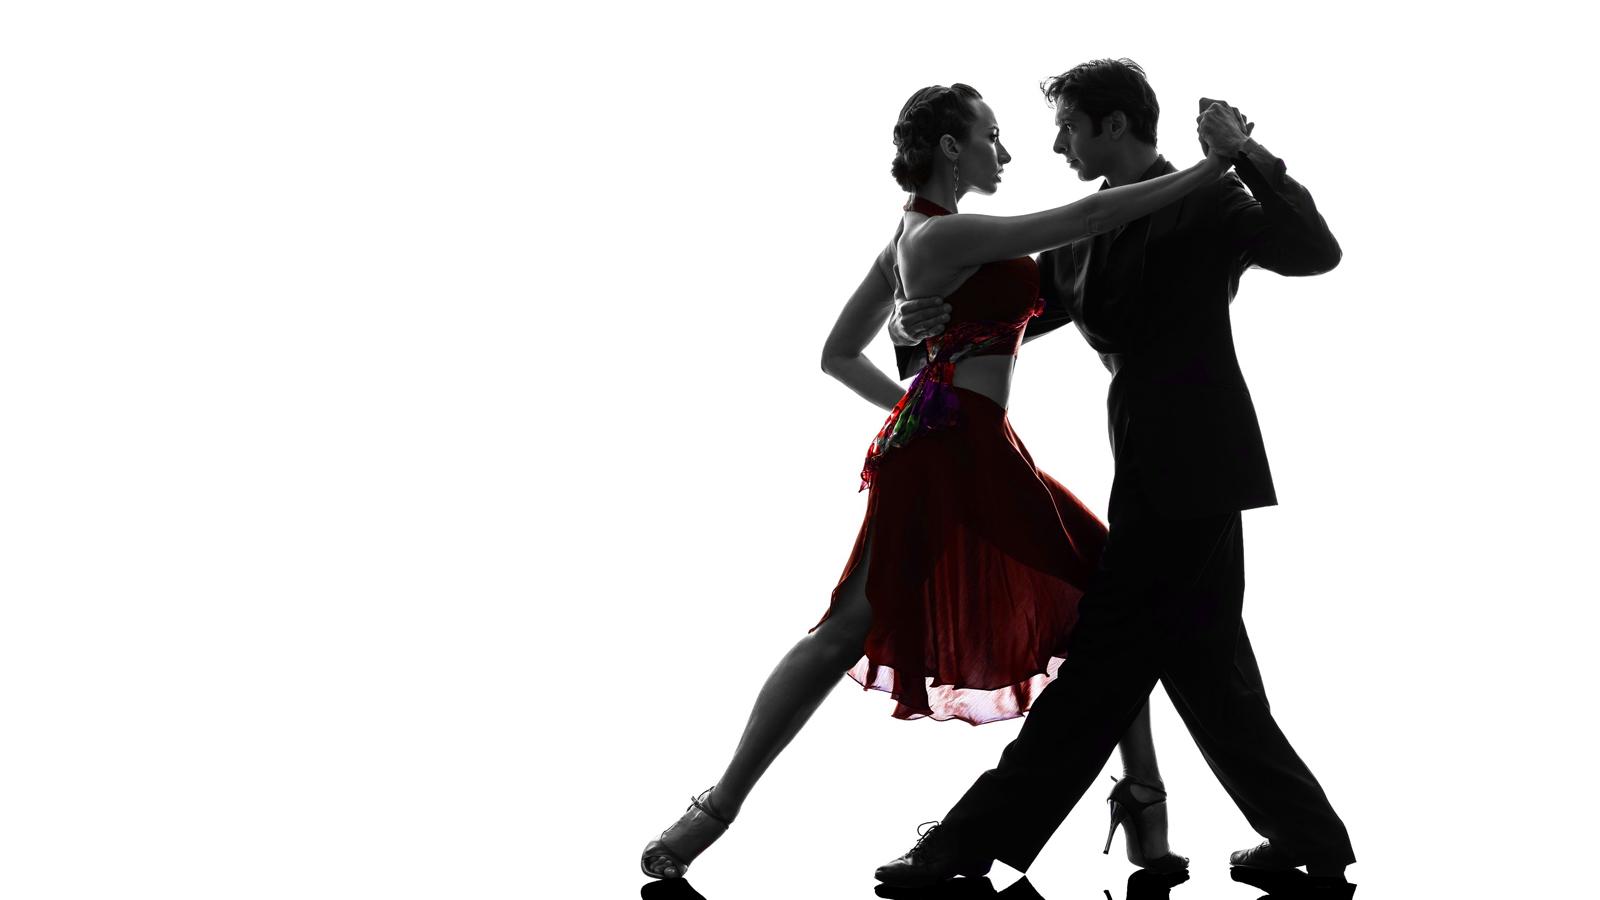 Ballroom Dancing PNG HD - 139622